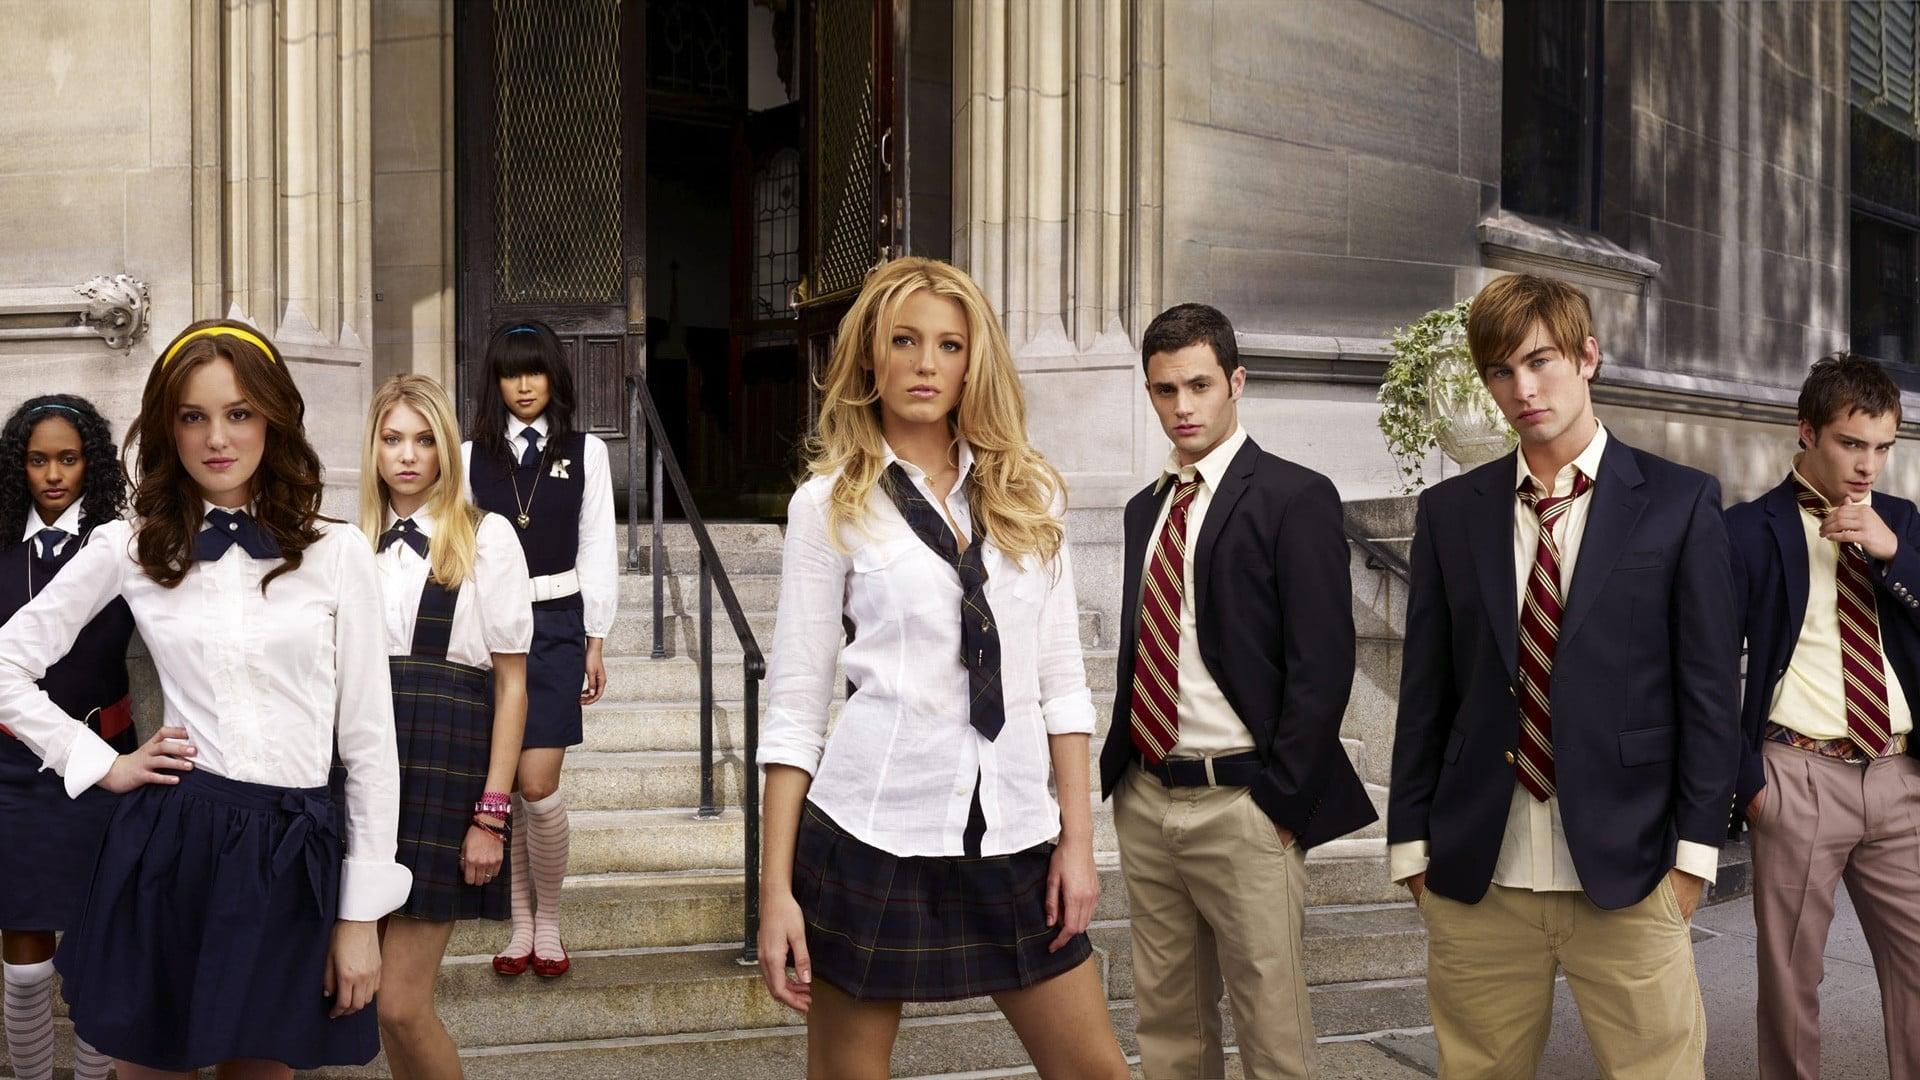 10 shows you should watch if you love 'Gossip Girl'